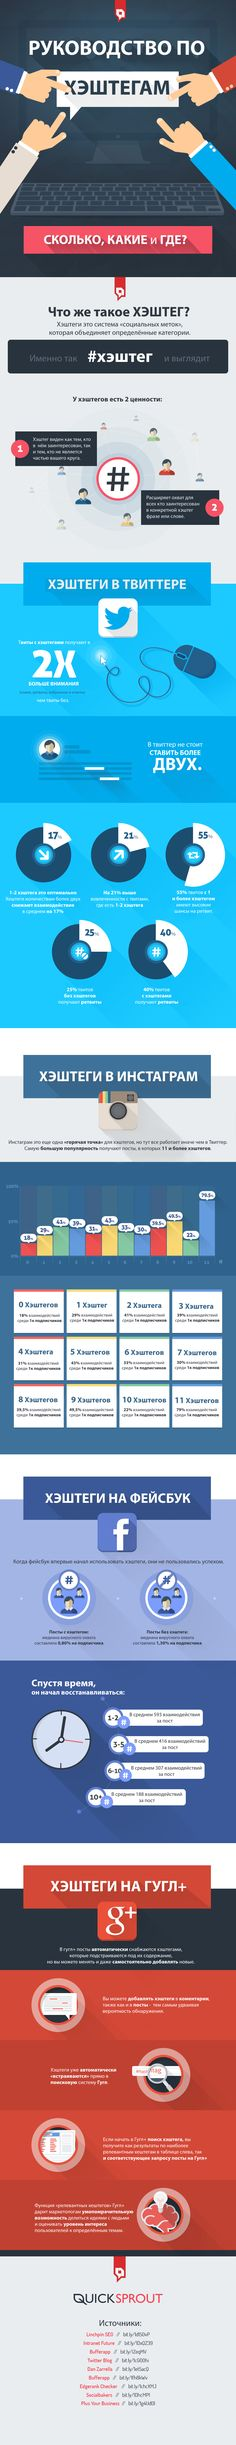 инфографика, хэштеги, маркетинг, smm, смм, facebook, twitter, google plus, google+, instagram, pinterest, советы по хэштегам, хештеги, хештег, руководство по хэштегам